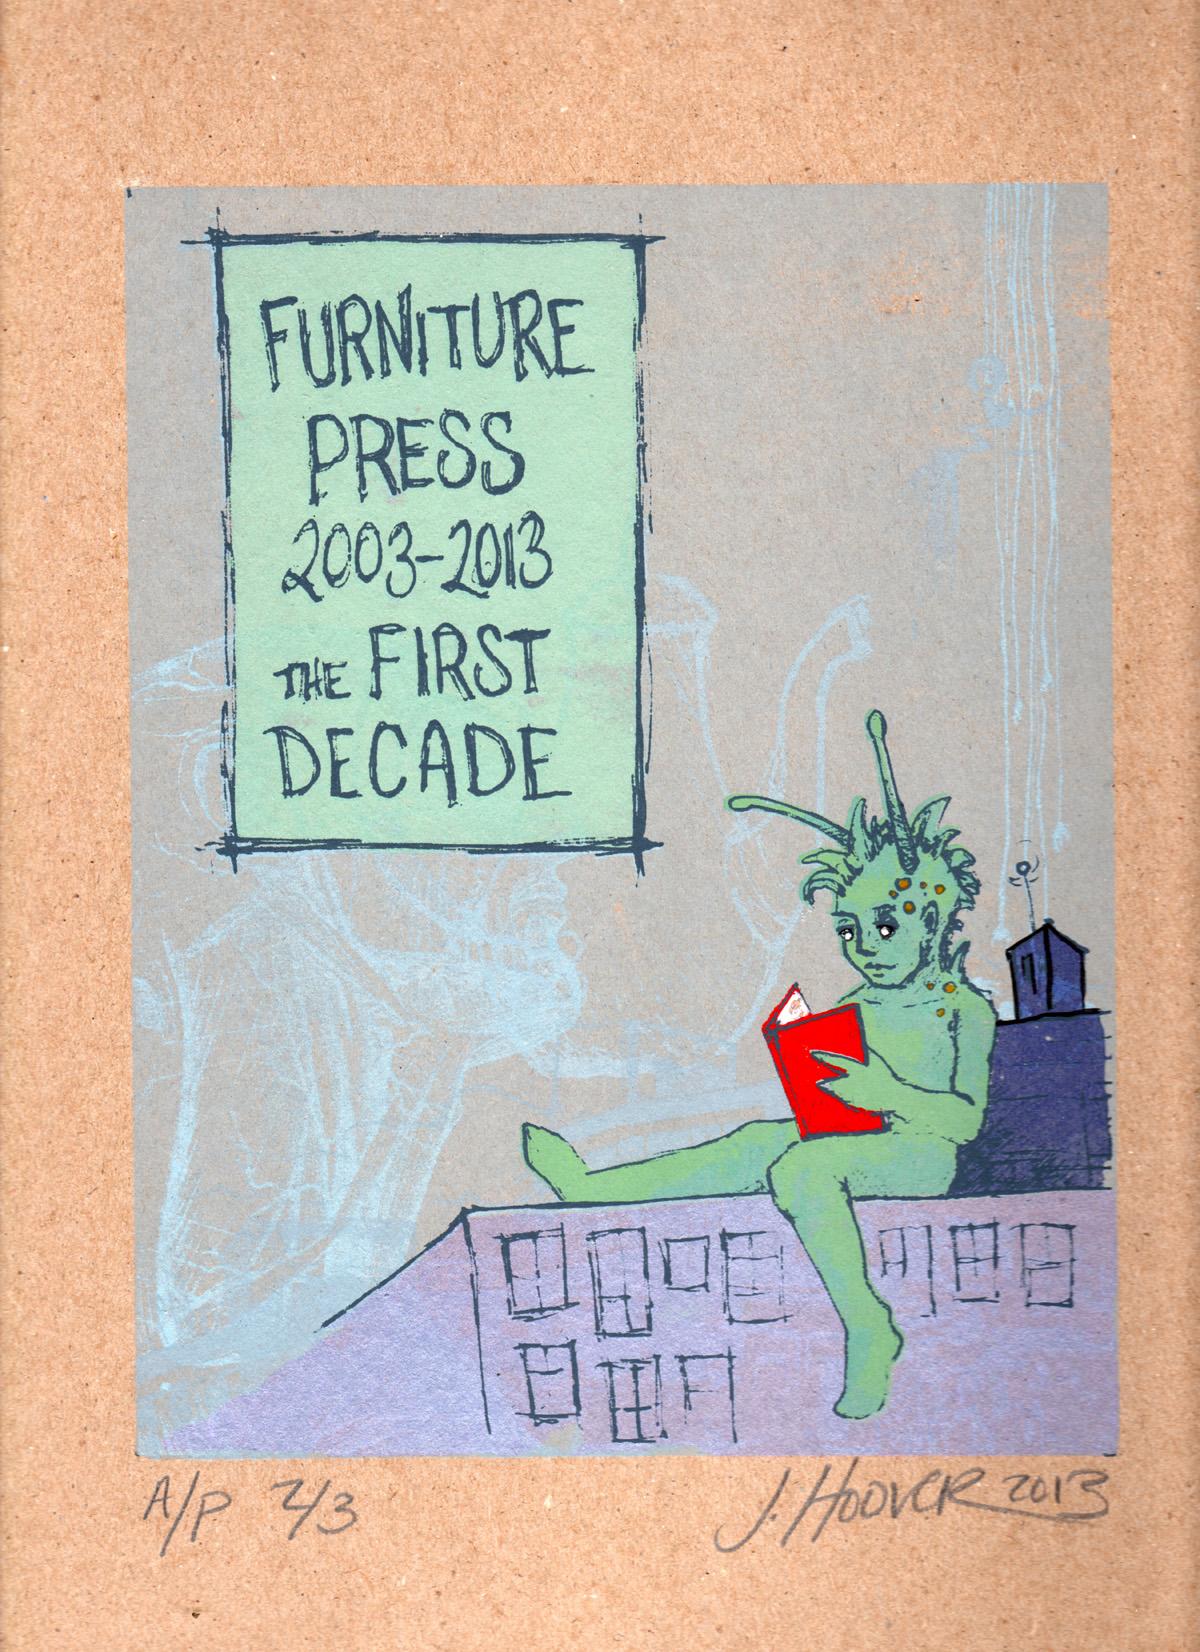 Furniture Press 10th Anniversary Broadside, 2013